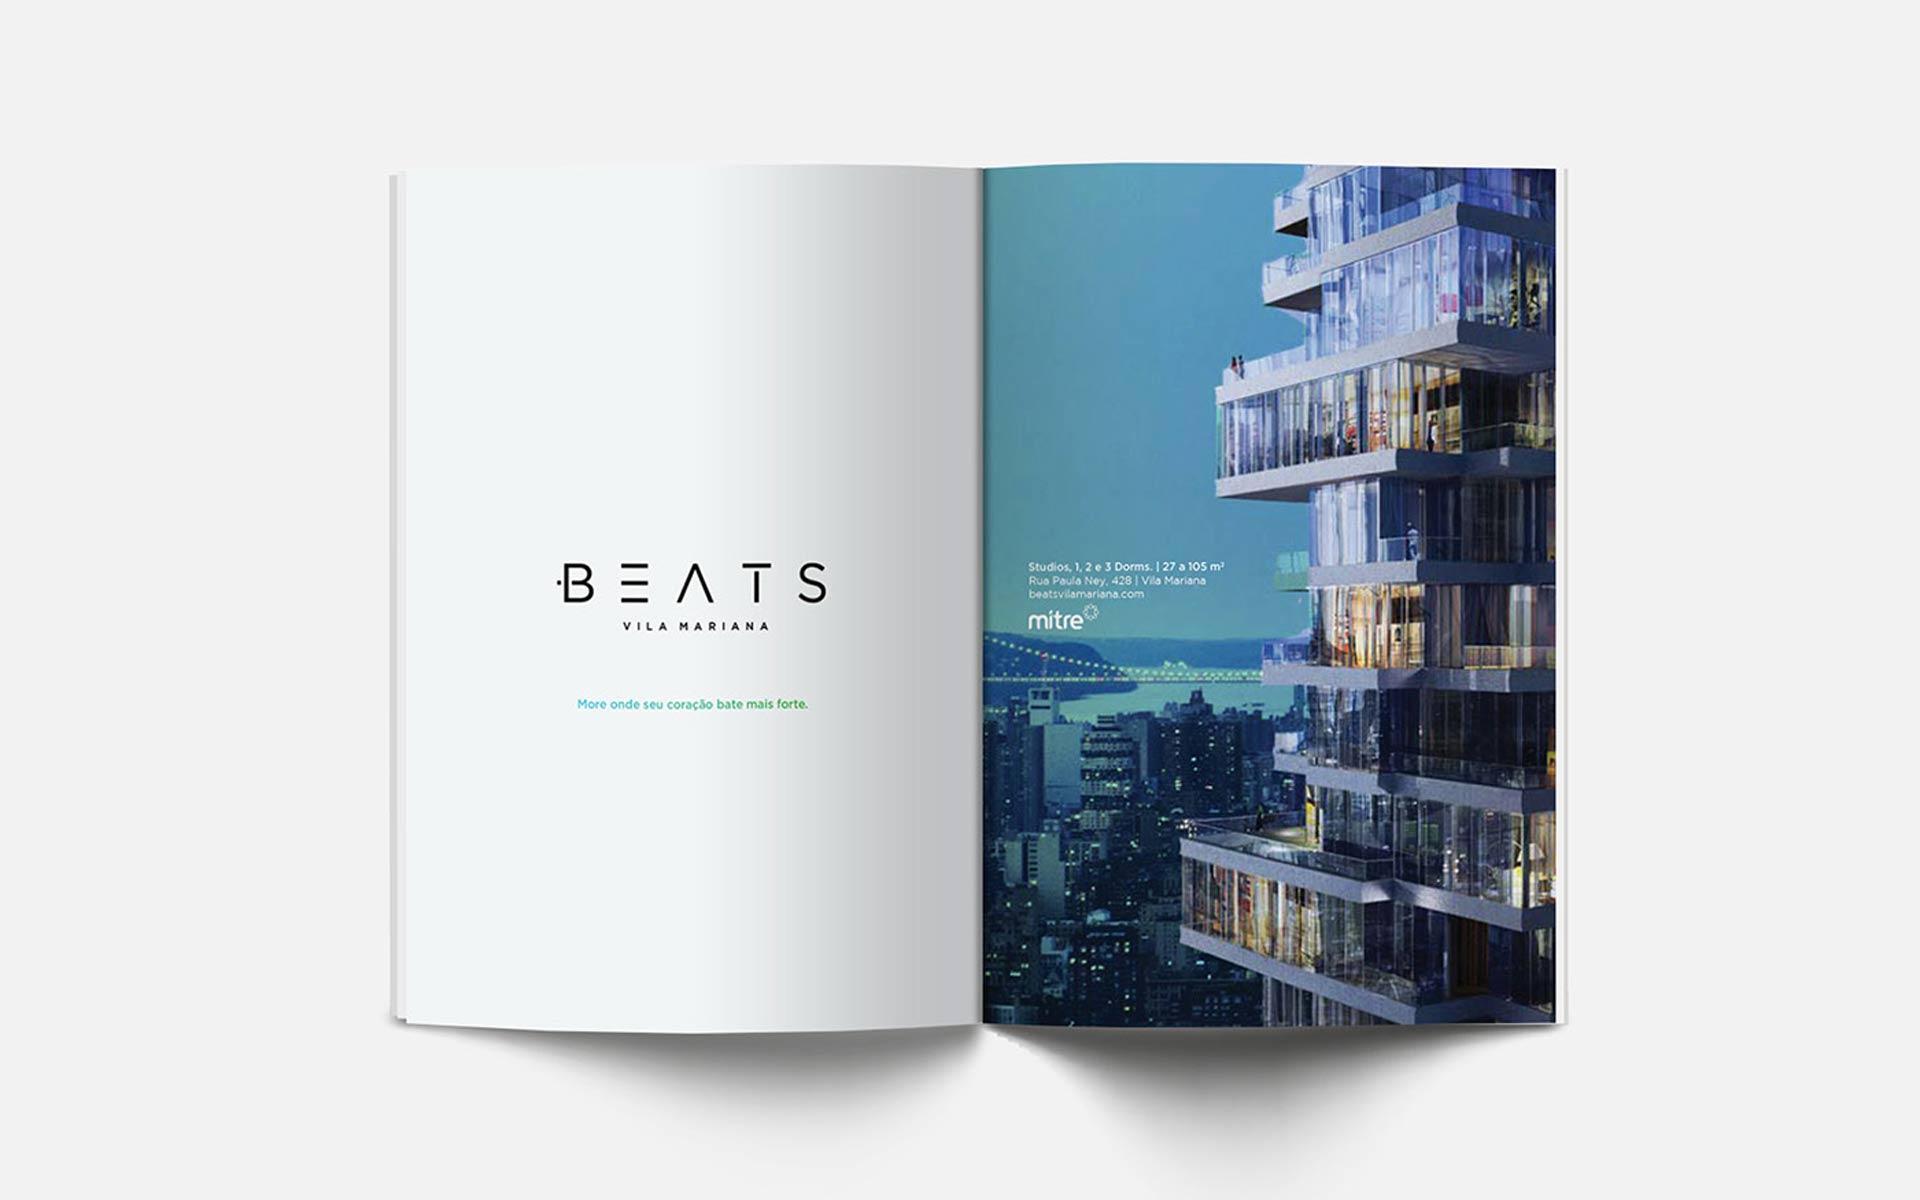 beats-anuncio1-ramonmaia-design-portfolio